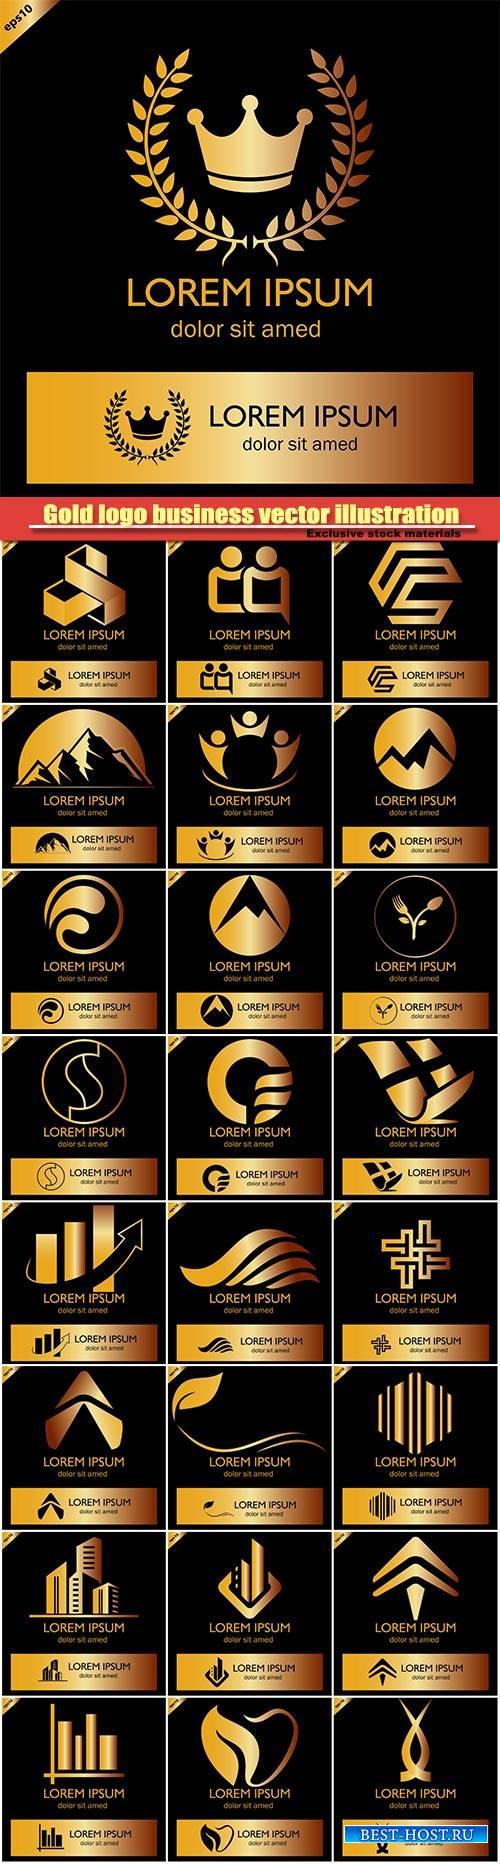 Gold logo business vector illustration #13